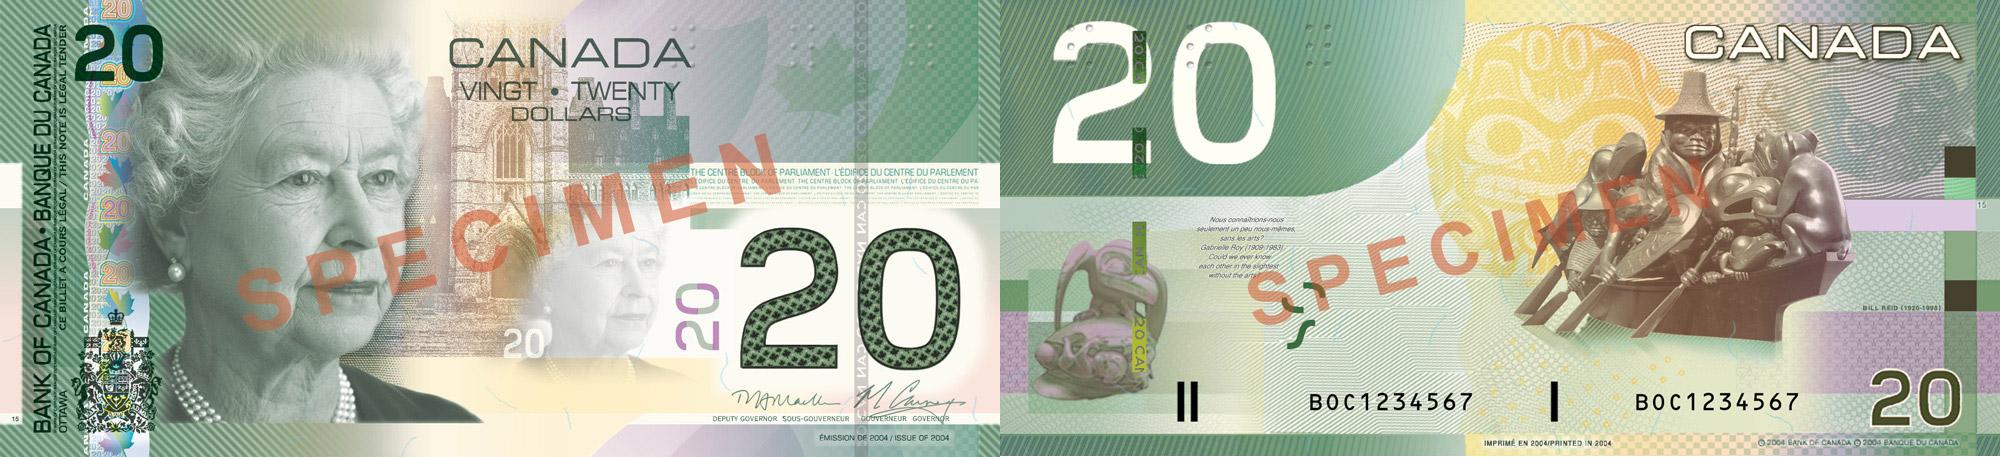 20 dollars 2004-2006 - Billet de banque du Canada